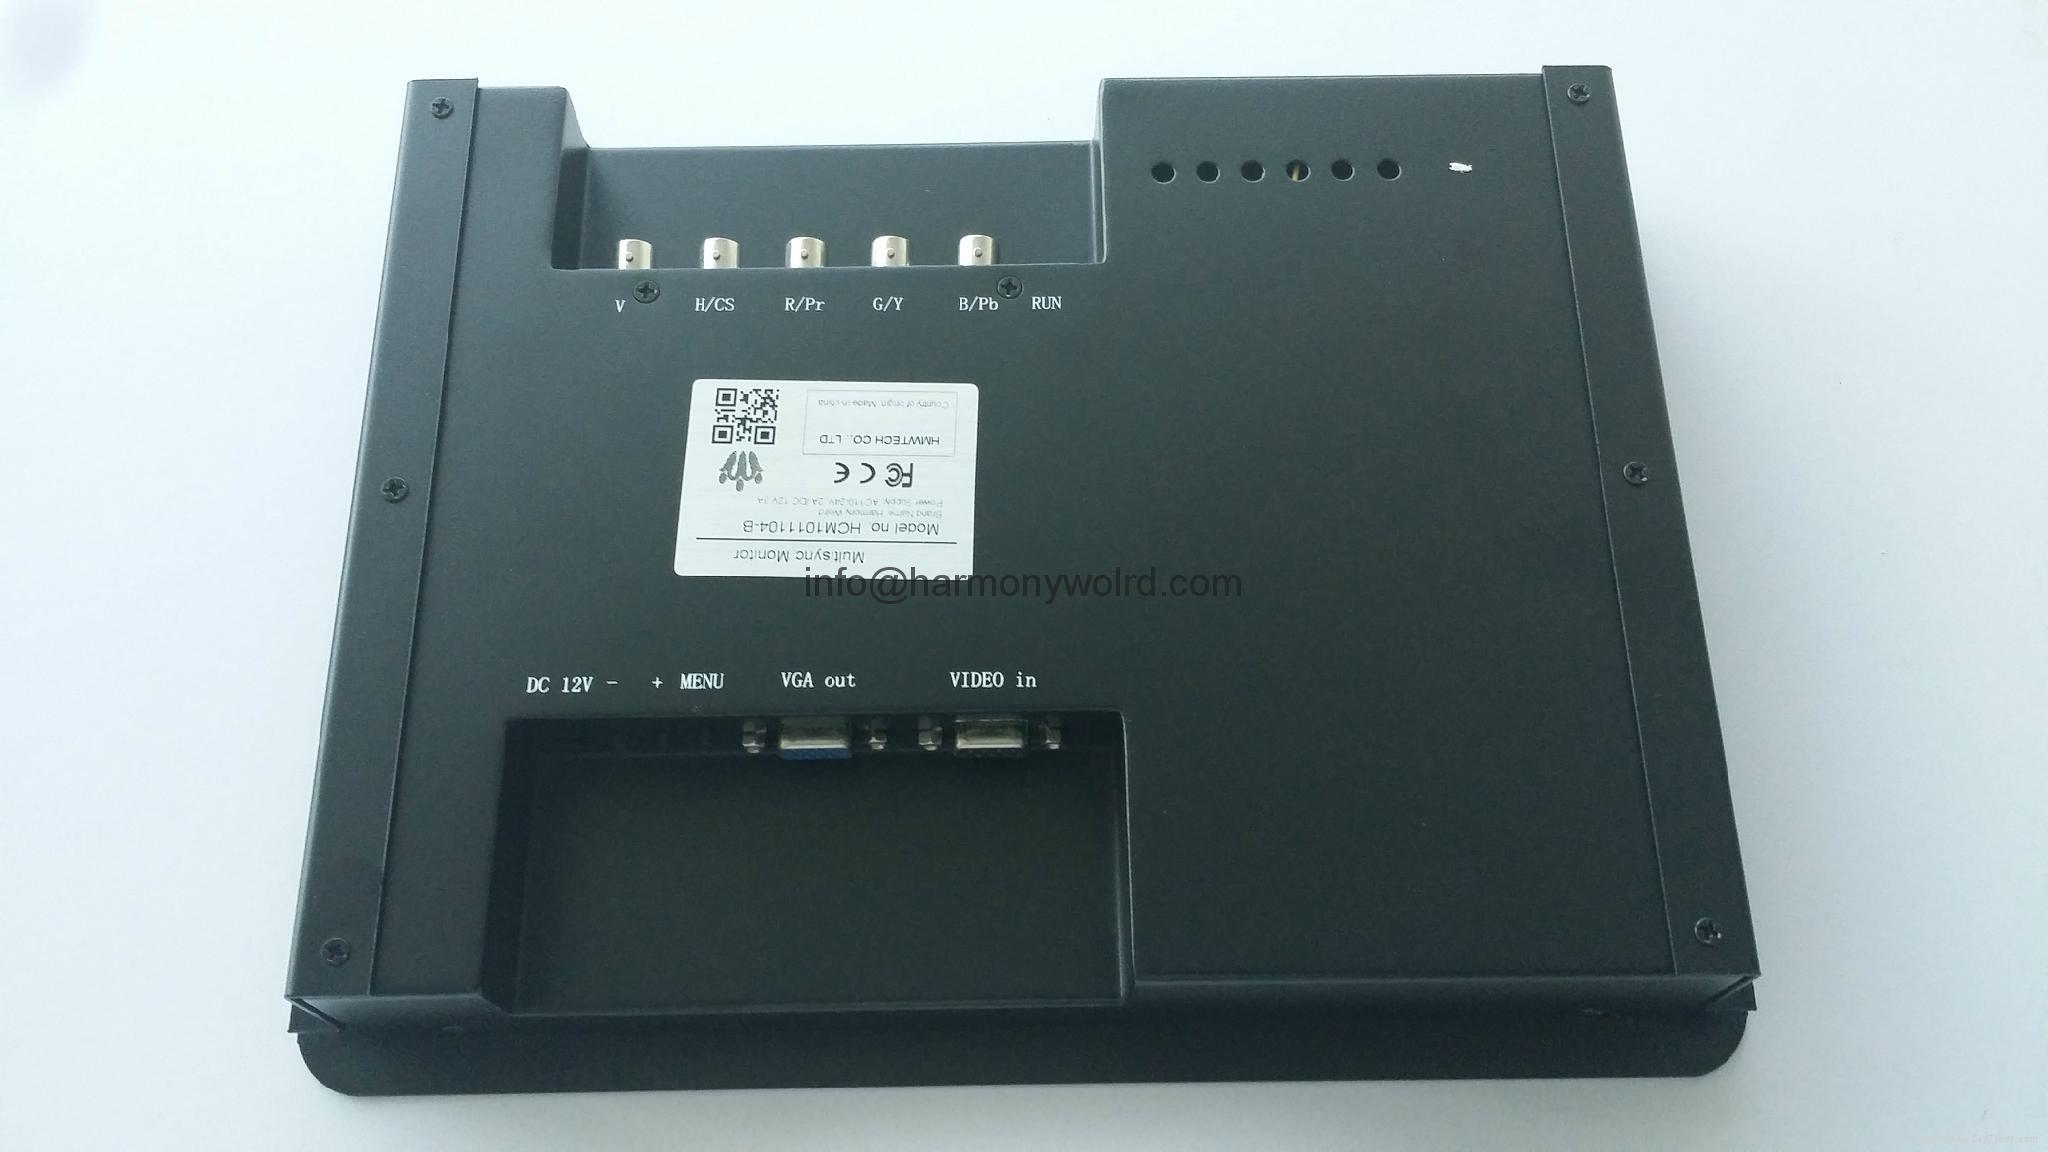 "Upgrade HANTAREX MT 3000 5"" / 9"" /12"" OPEN FRAME MONO MONITOR to NEW LCD Monitor 7"